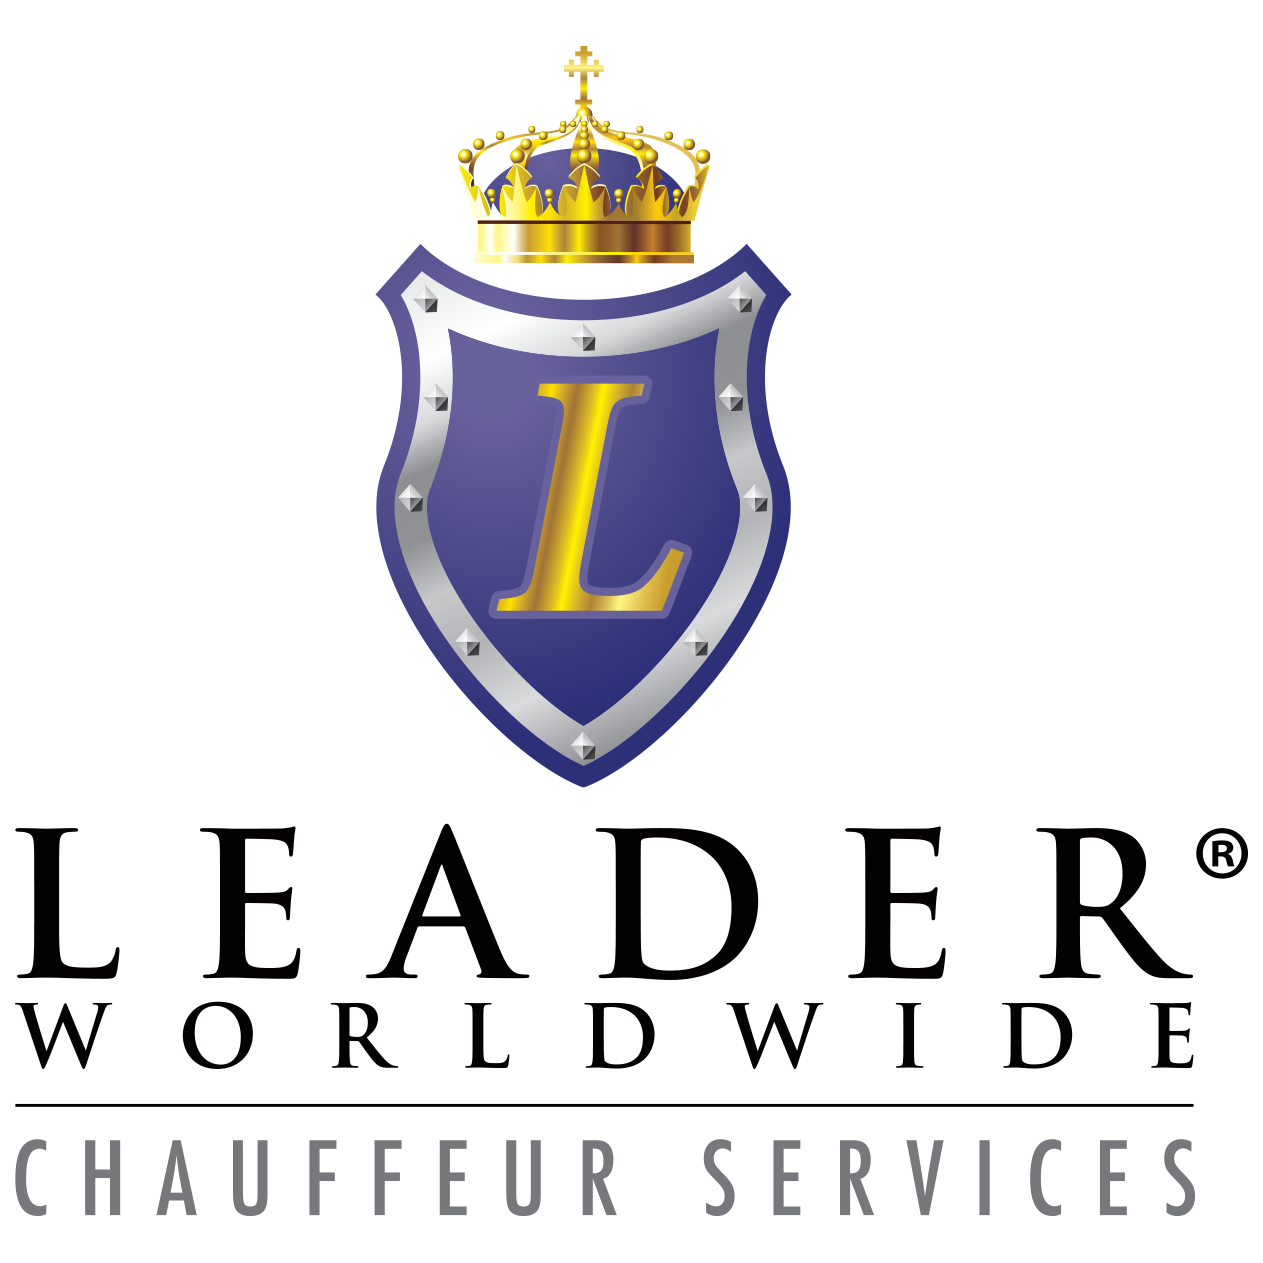 Leader Worldwide Chauffeur Services